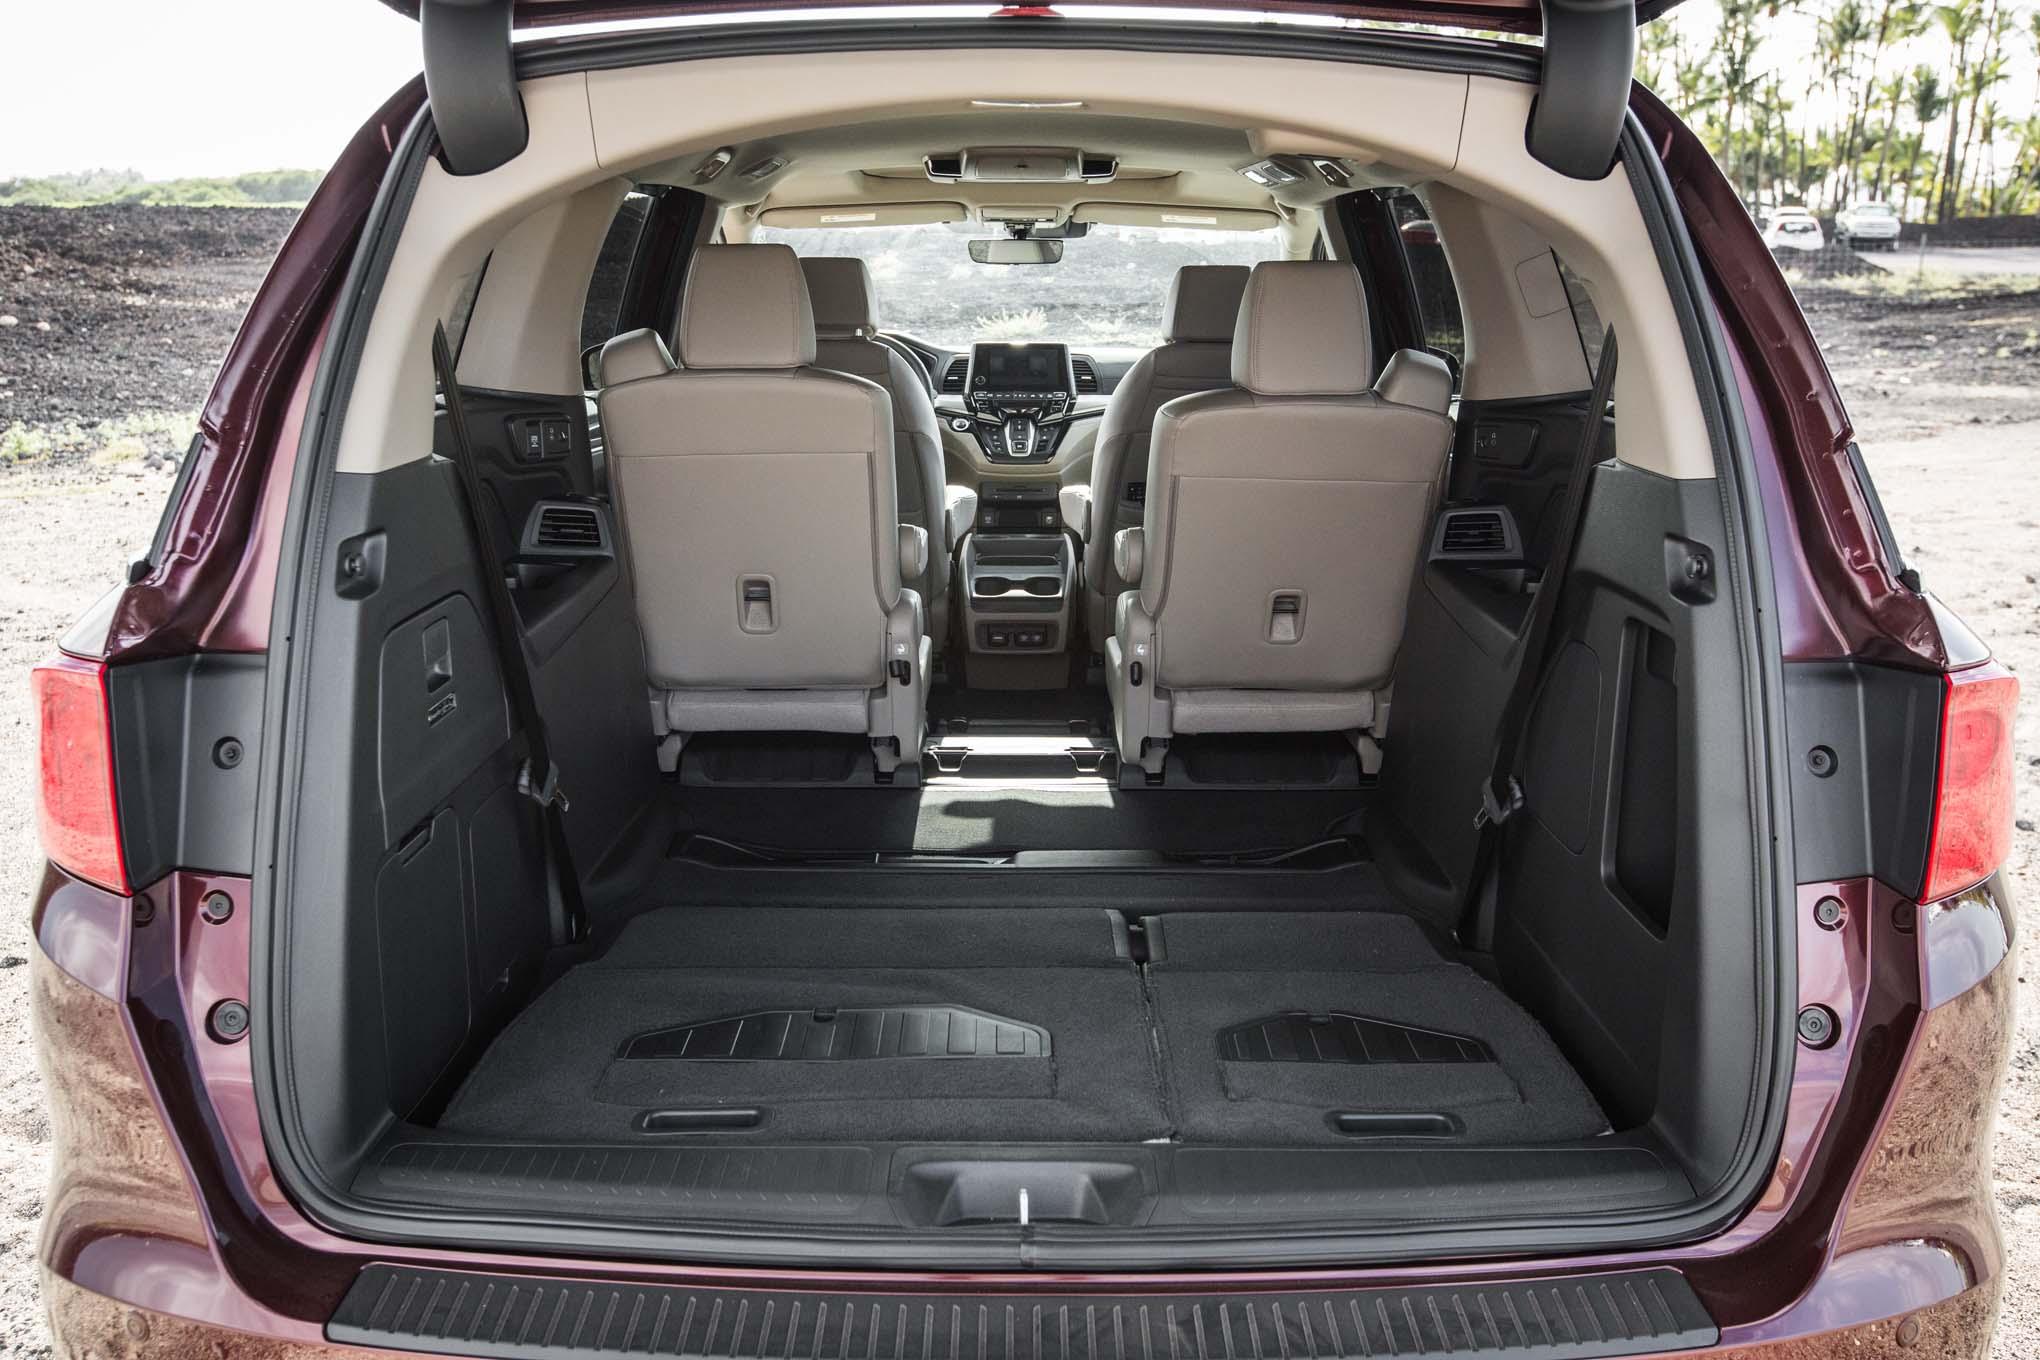 Honda Pilot Cargo Space >> 2018 Honda Odyssey rear cargo space - Motor Trend en Español